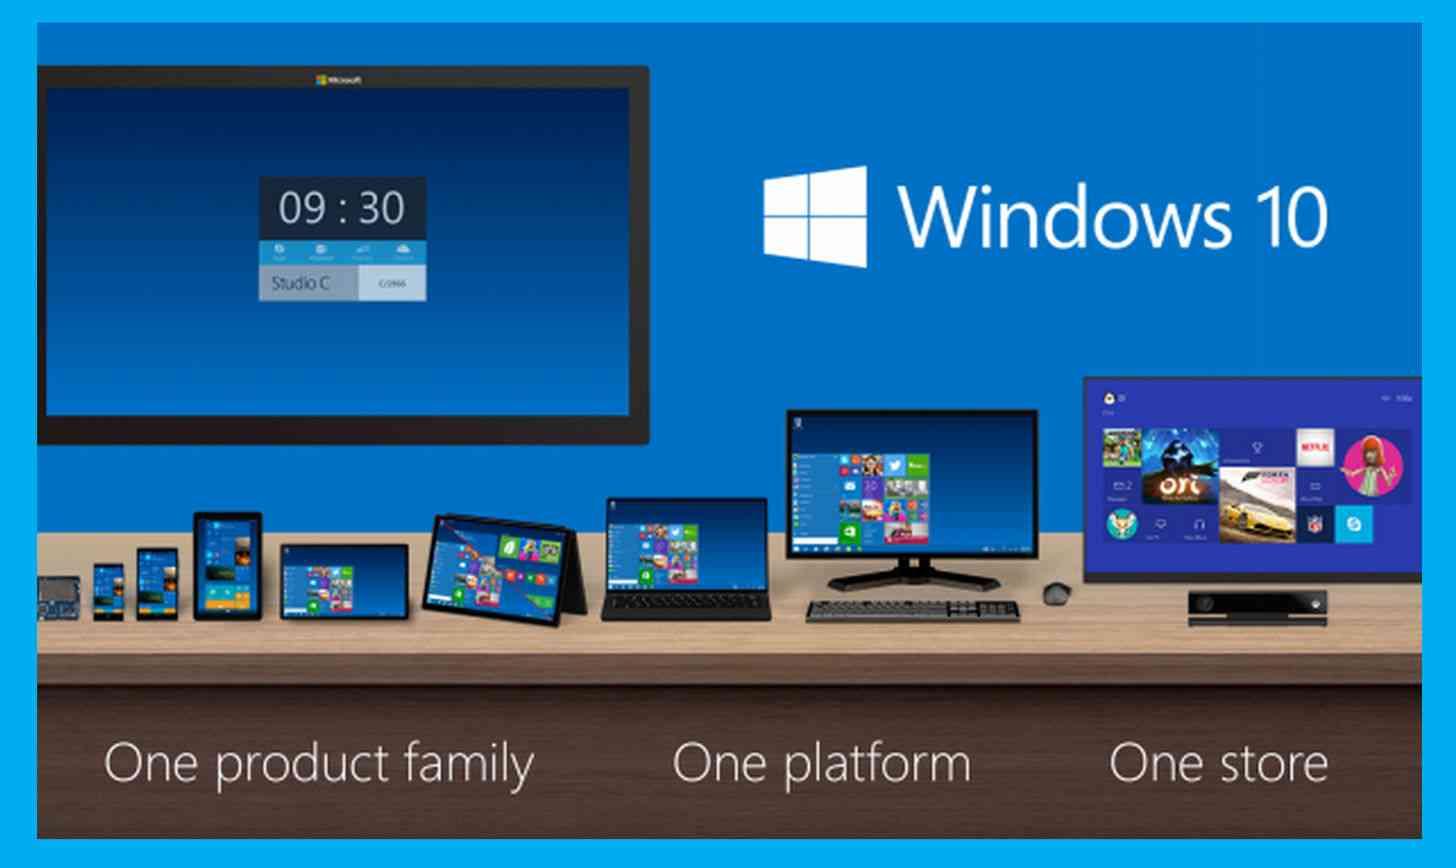 Microsoft Windows 10 family